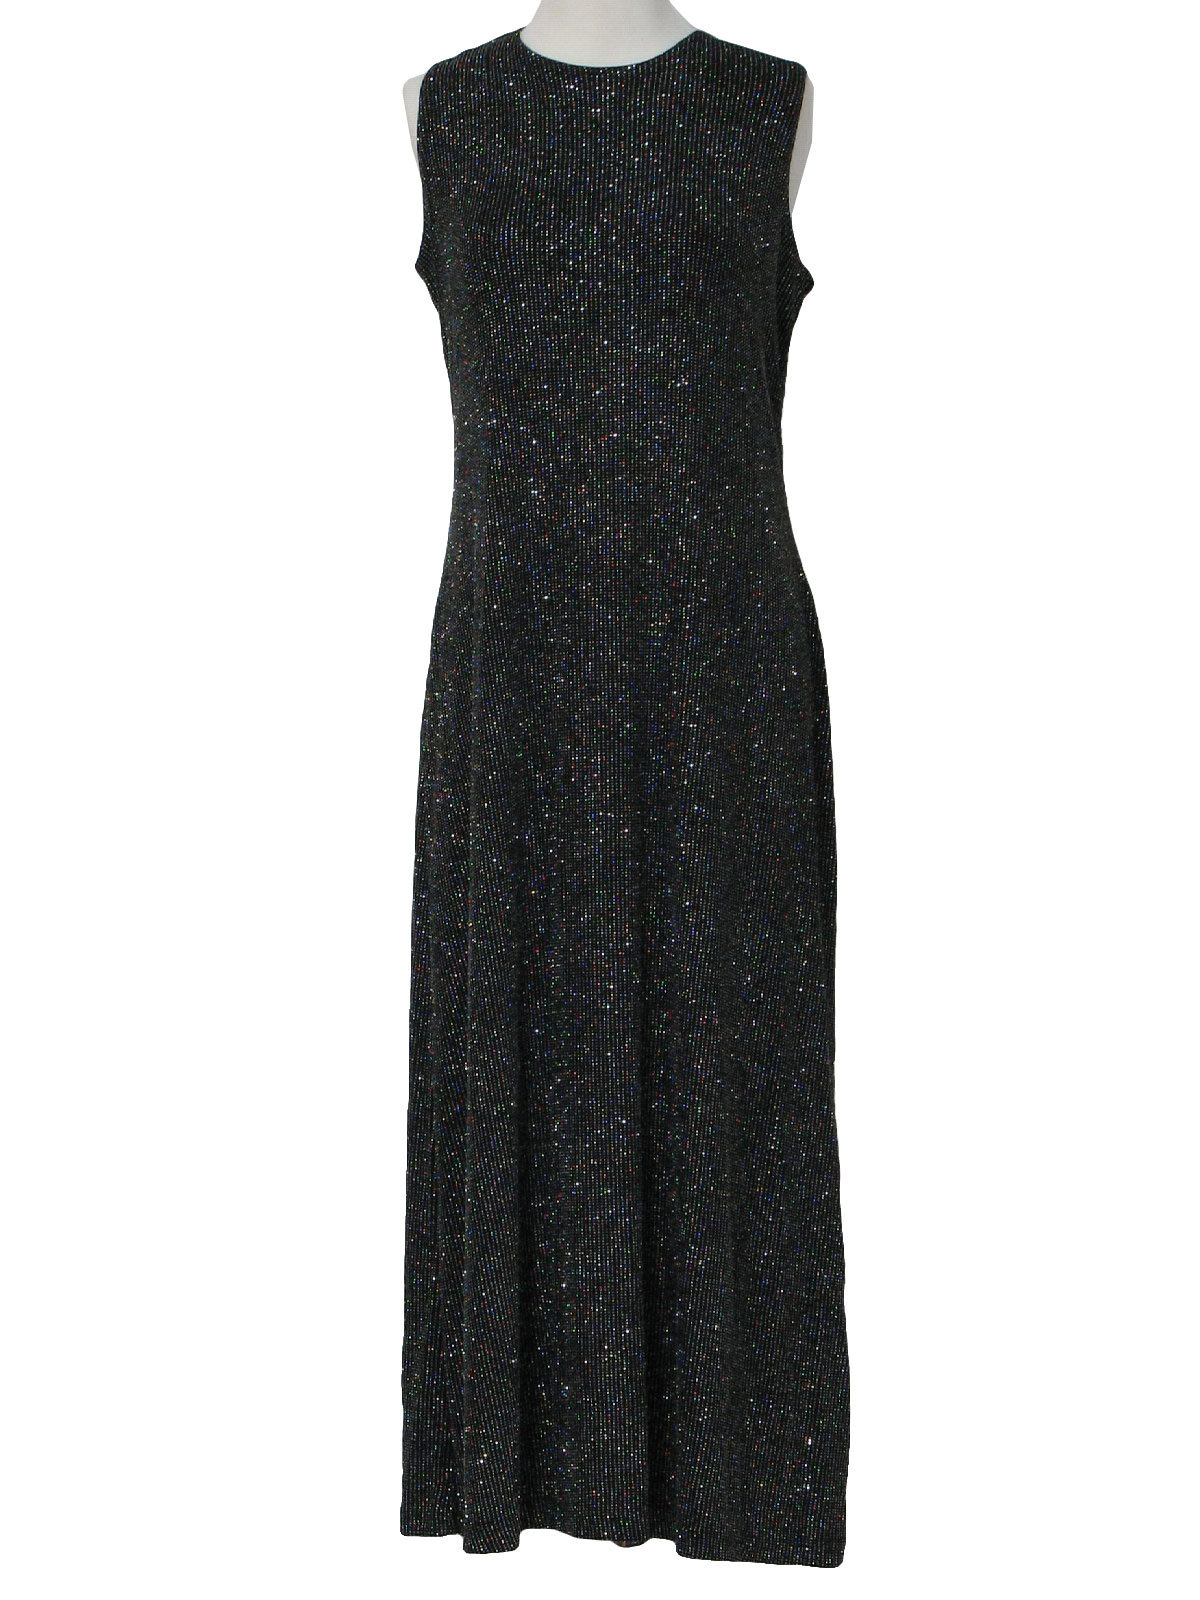 90s Retro Cocktail Dress: 90s -Ronni Nicole- Womens black and ...